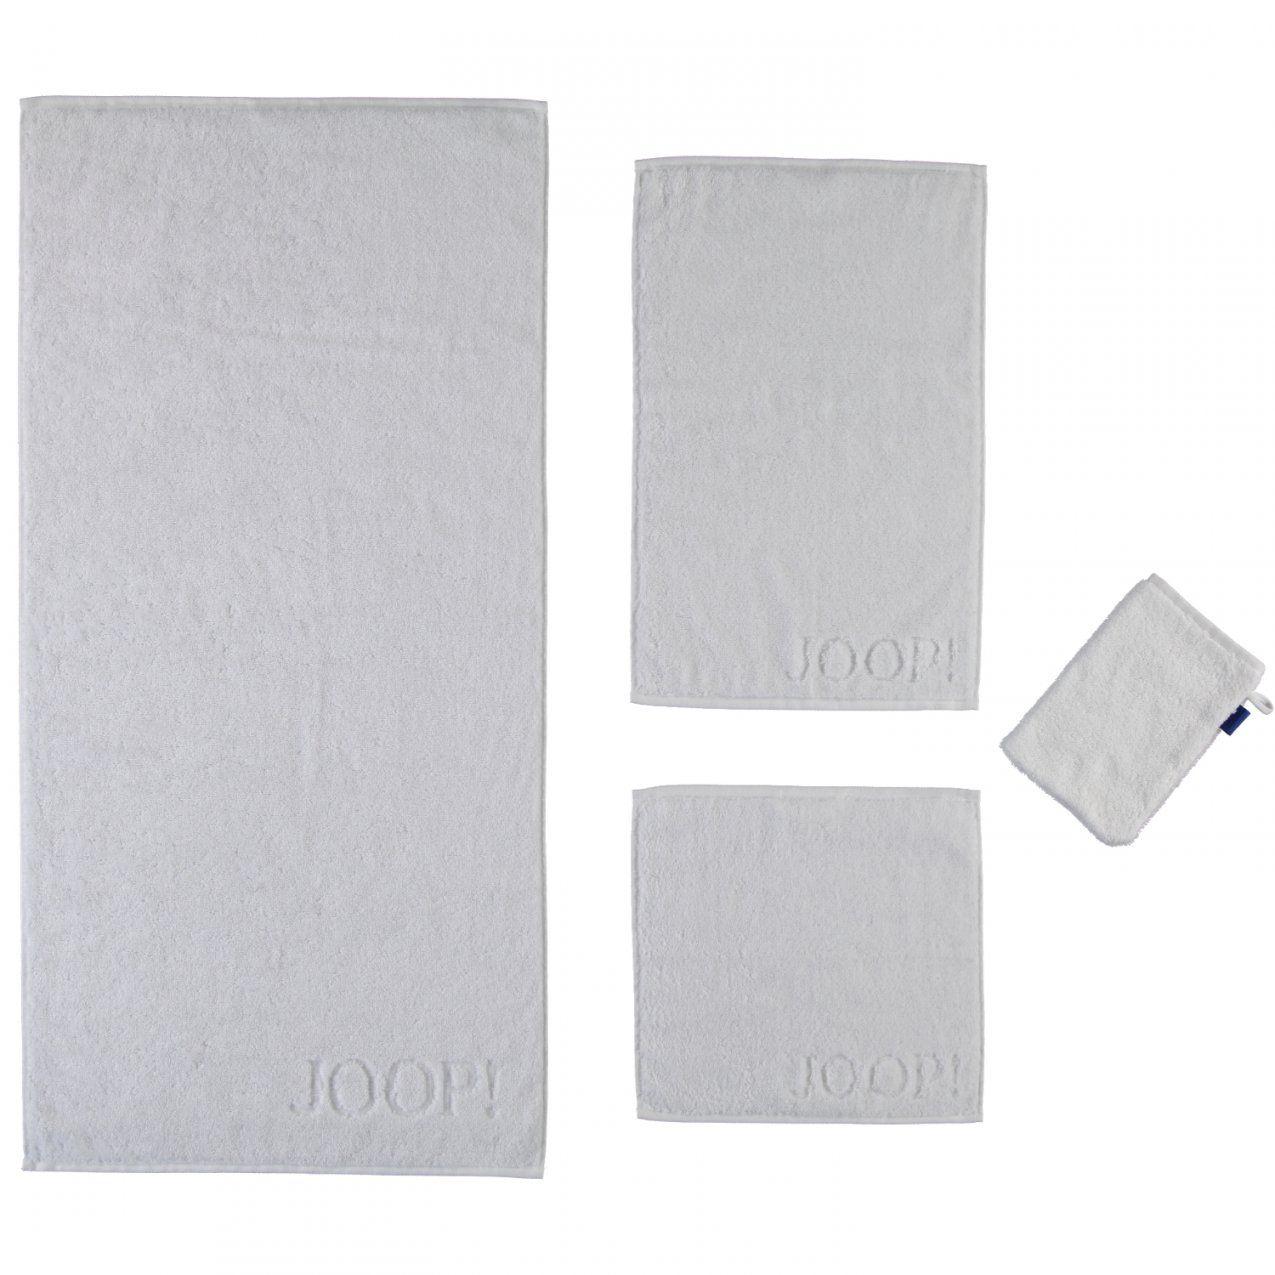 Joop Handtücher Basic Weiss  600  Handtuchwelt von Joop Handtücher Set Günstig Bild